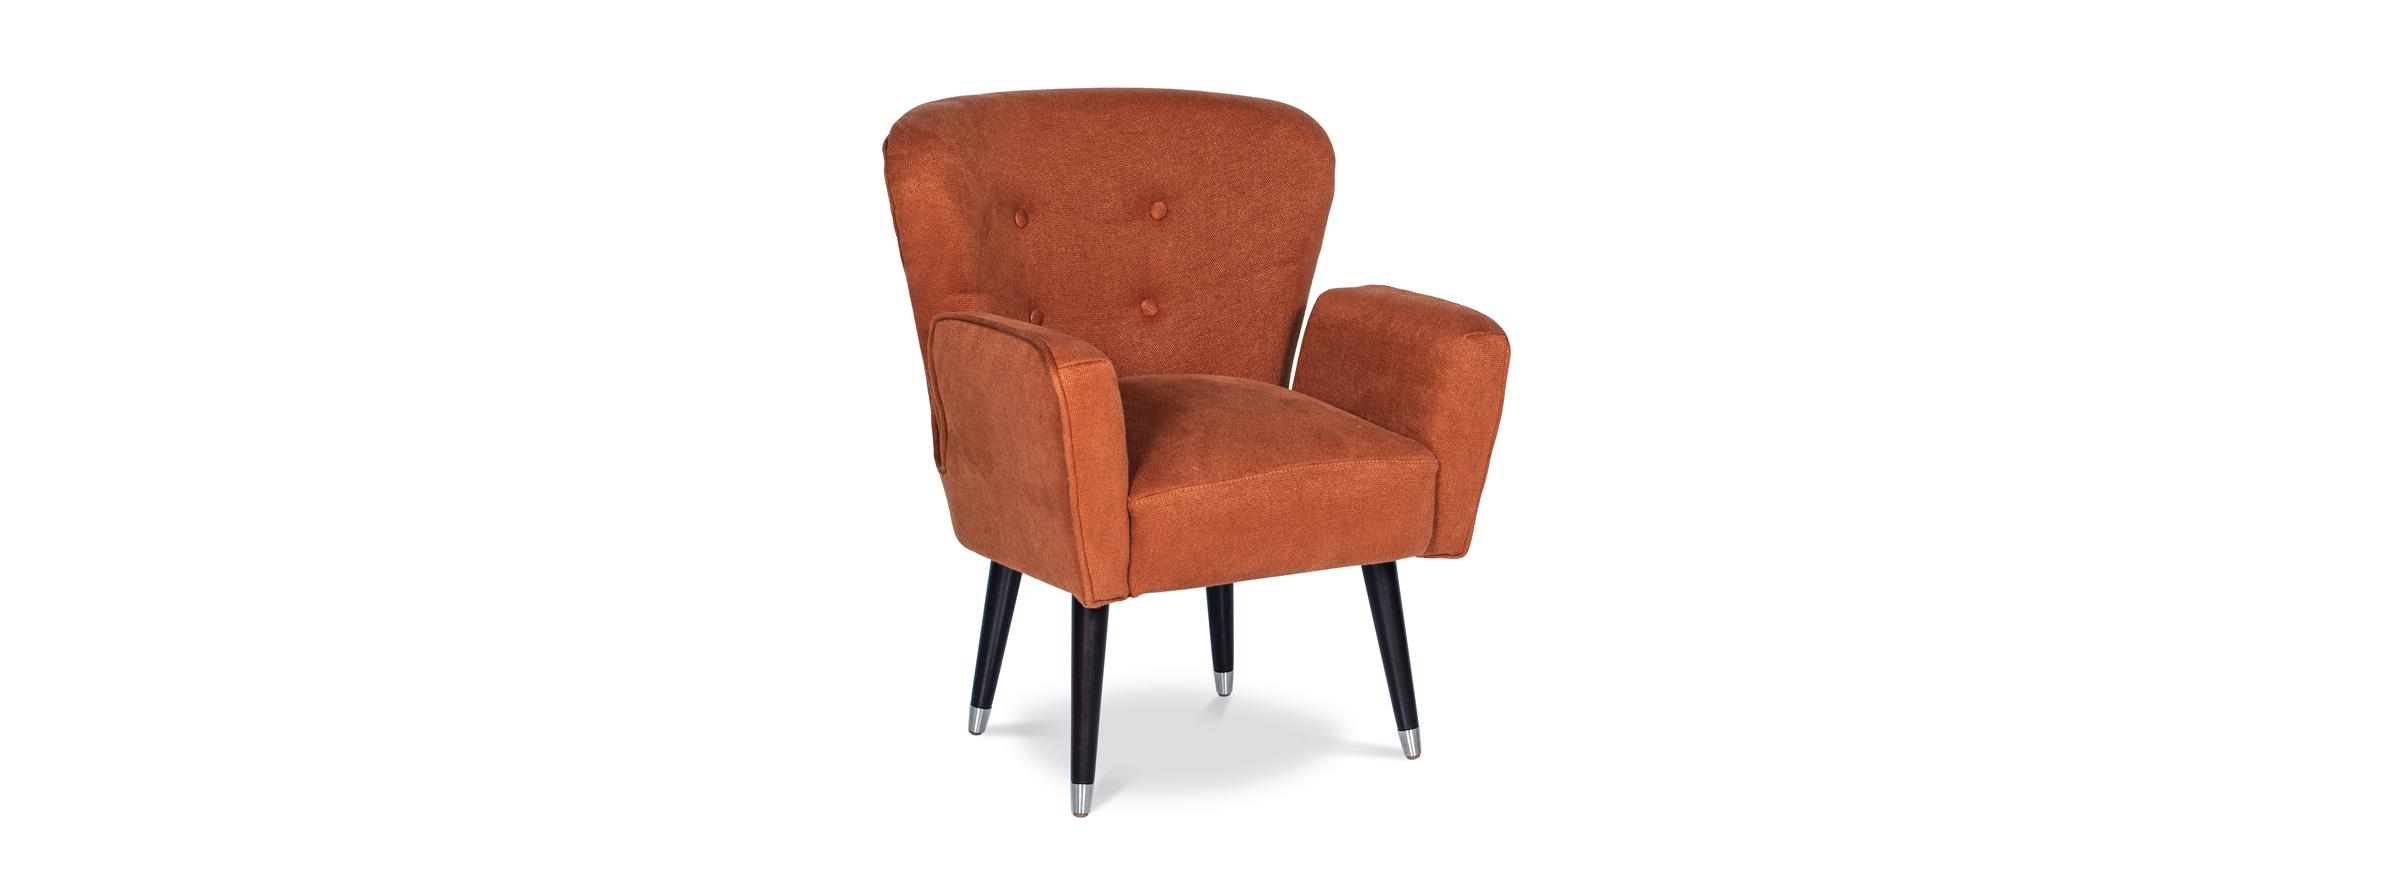 Désio-TRESHONORE-fauteuil-personnalisable-made-in-france-tissu-architecte-qualité